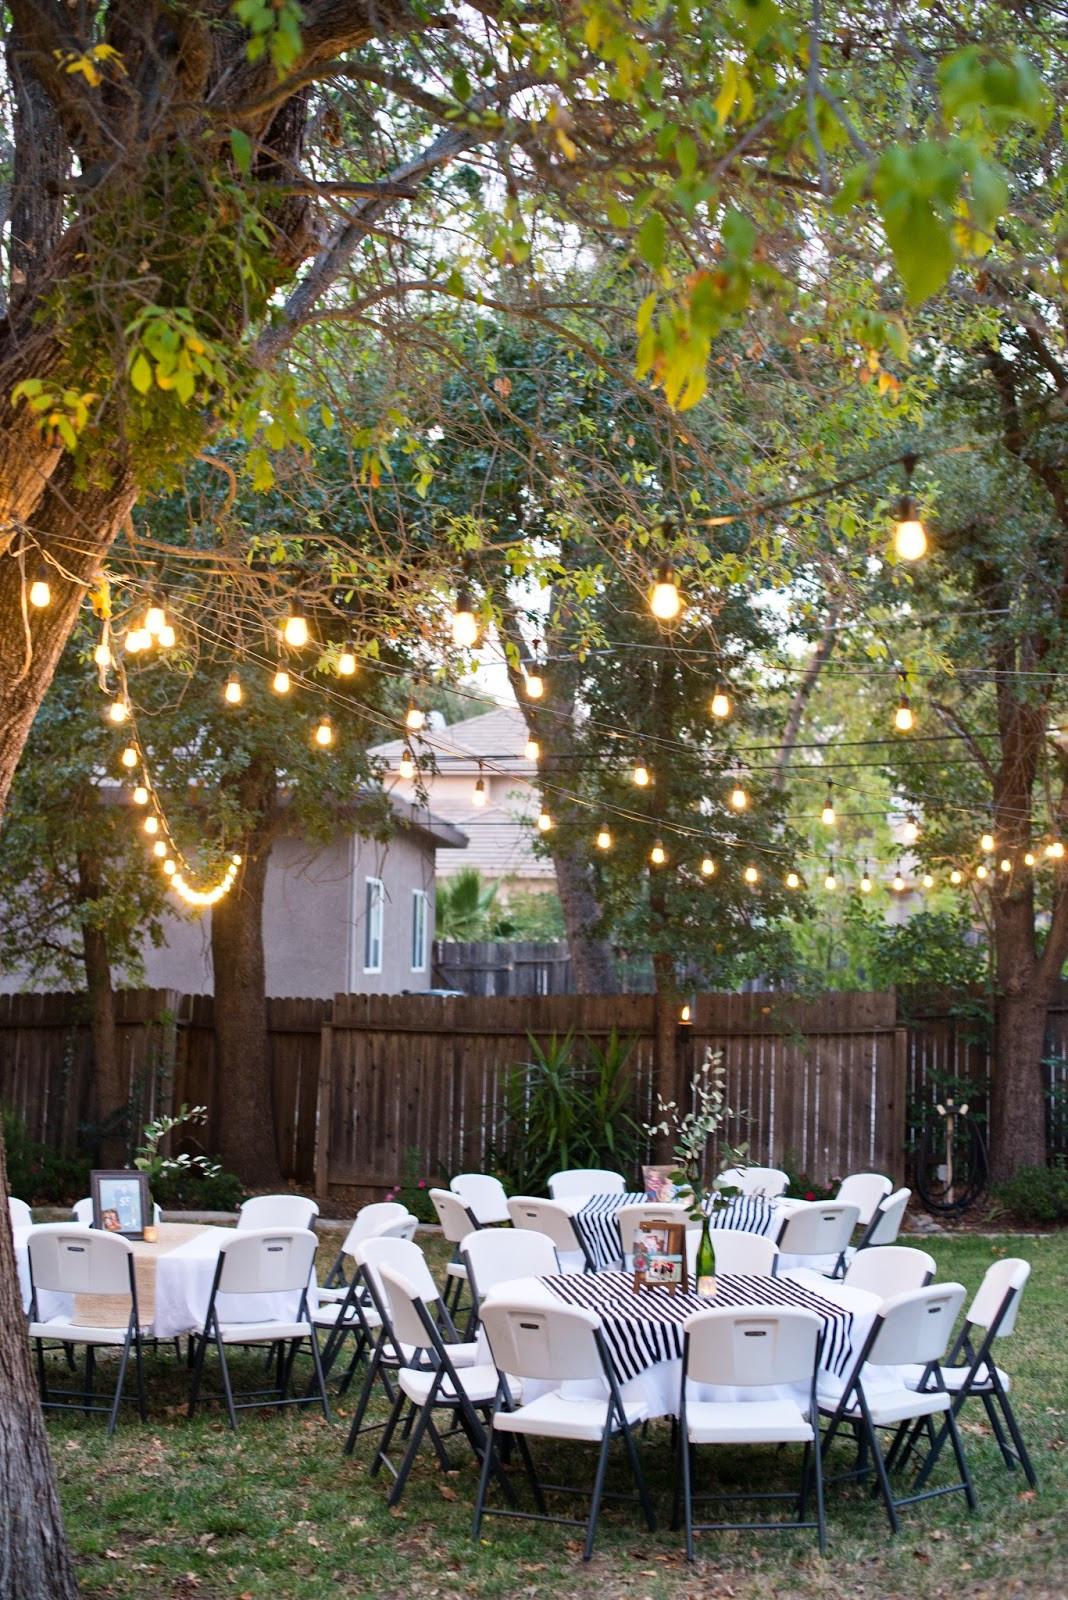 Pinterest Backyard Party Ideas  Domestic Fashionista Backyard Birthday Party For the Guy